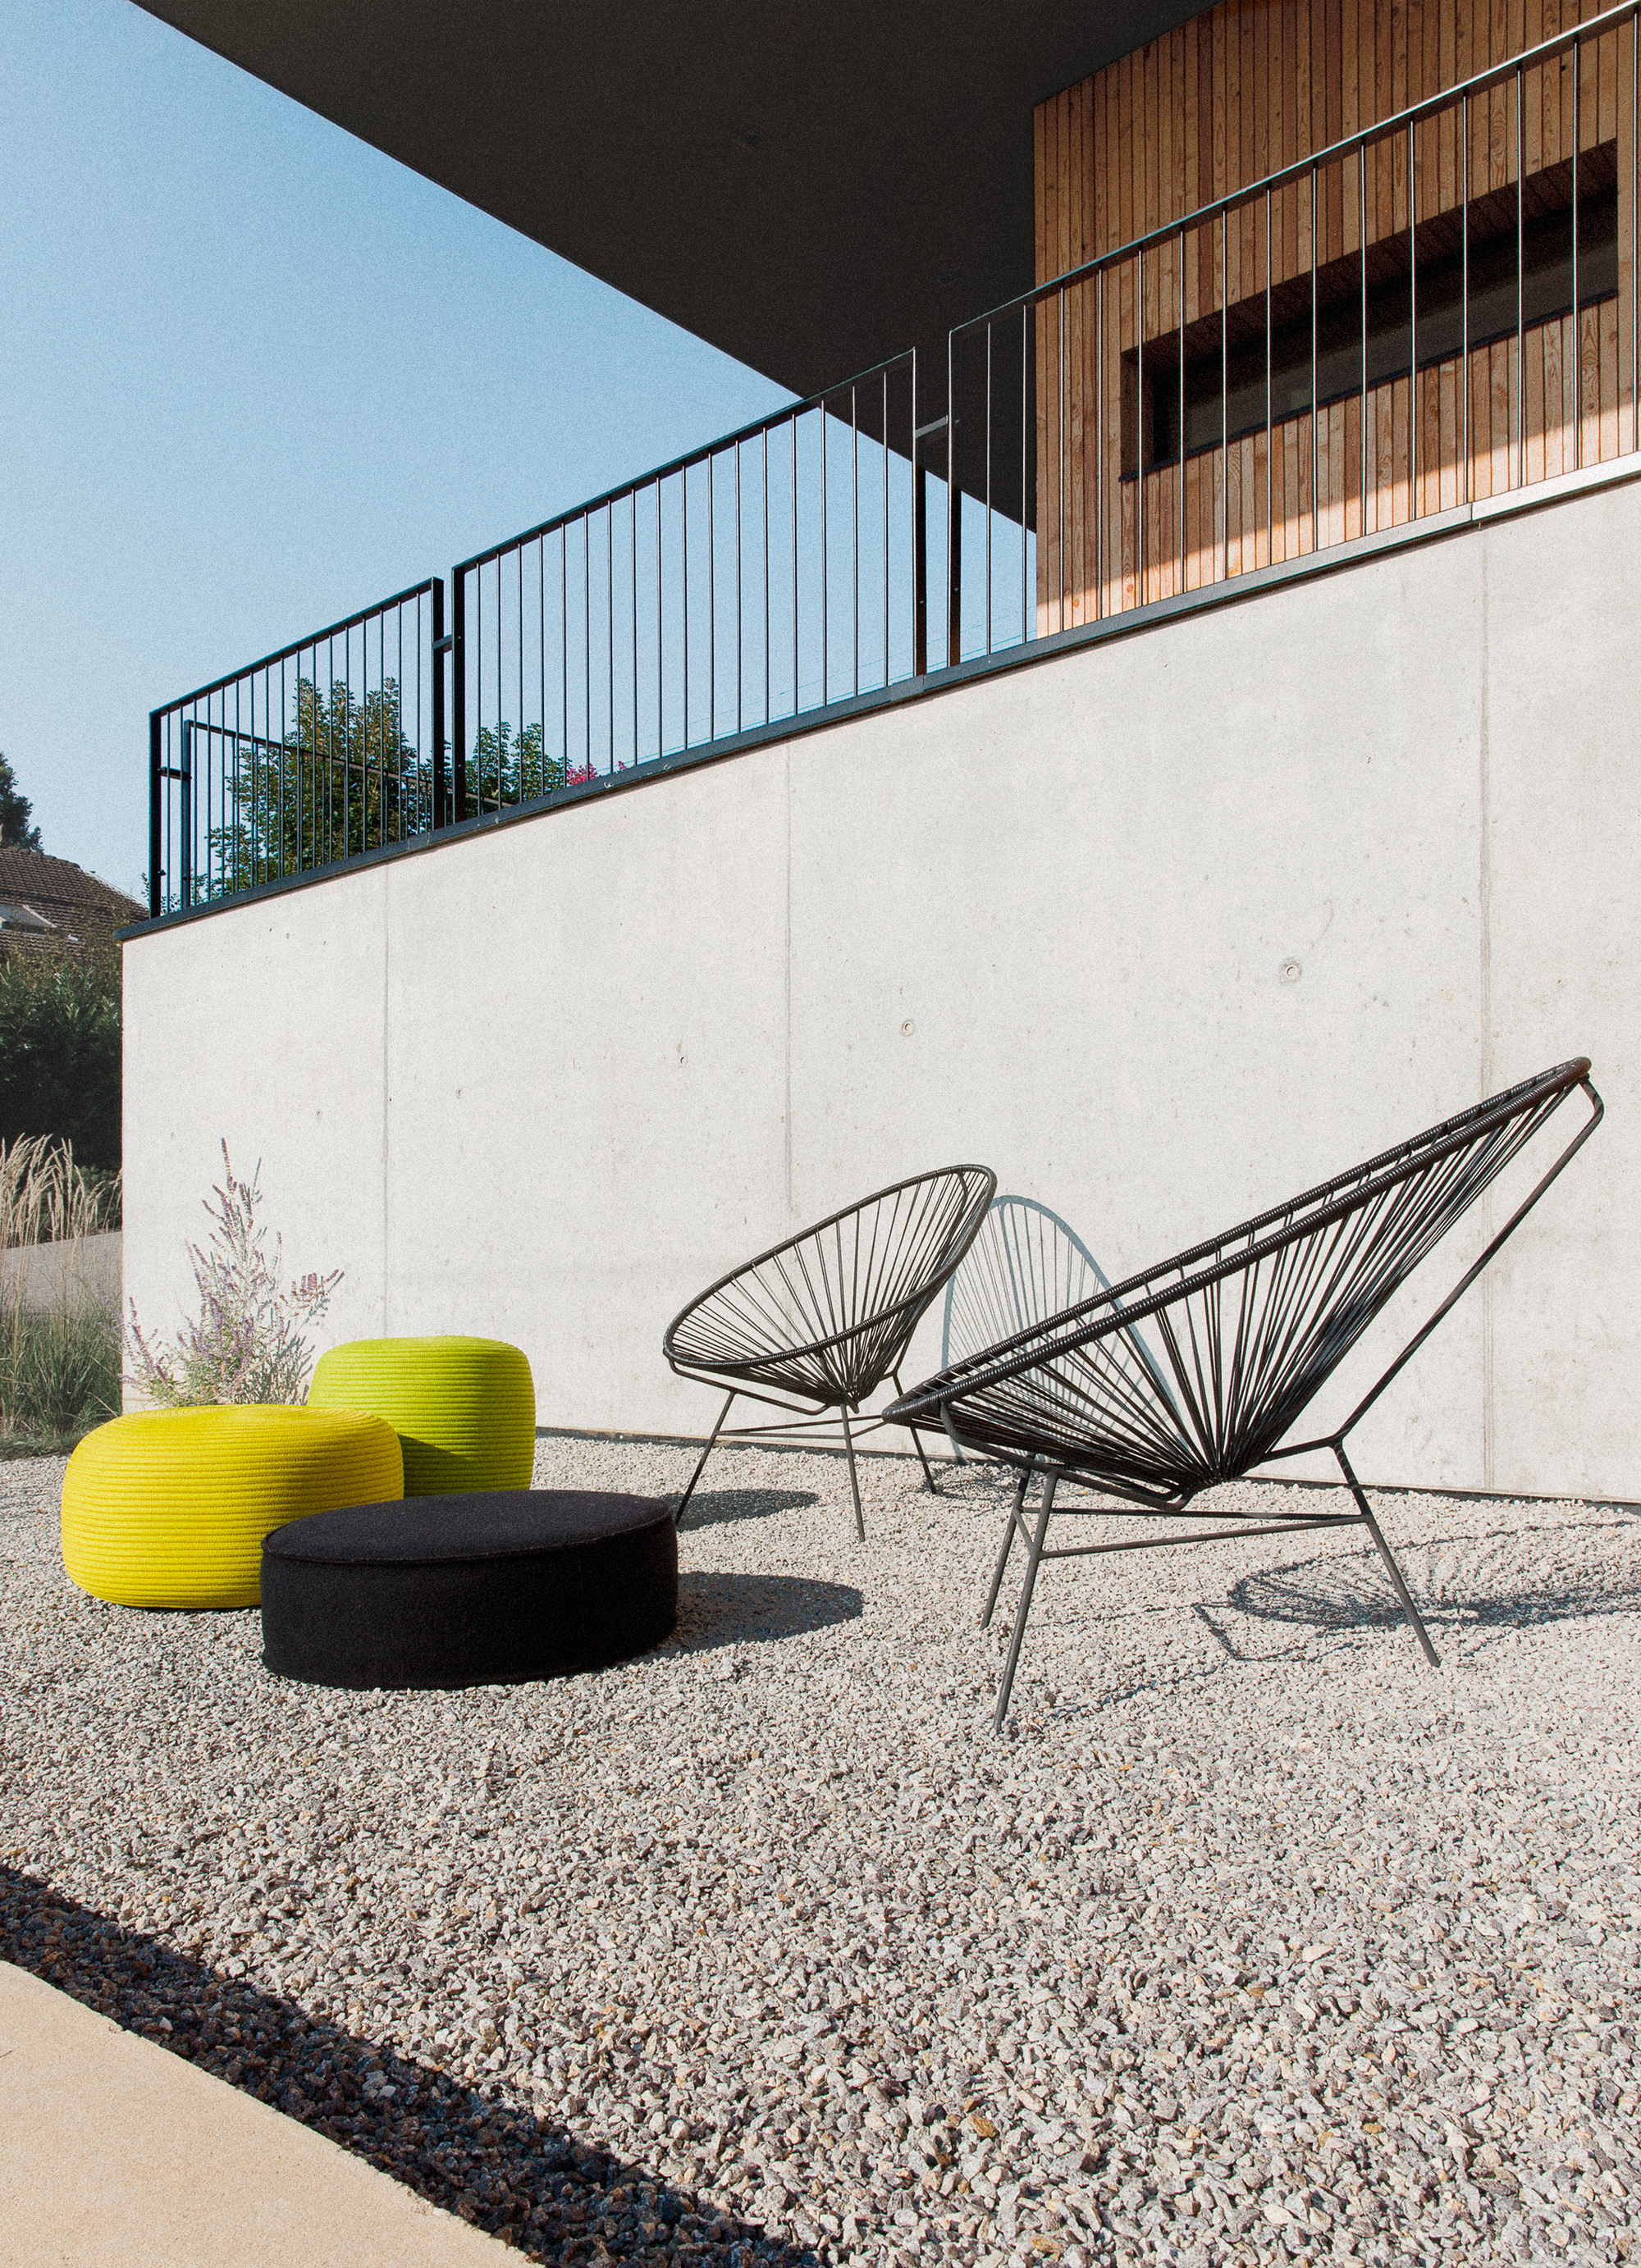 gallery of la maison etir e barres coquet 6. Black Bedroom Furniture Sets. Home Design Ideas